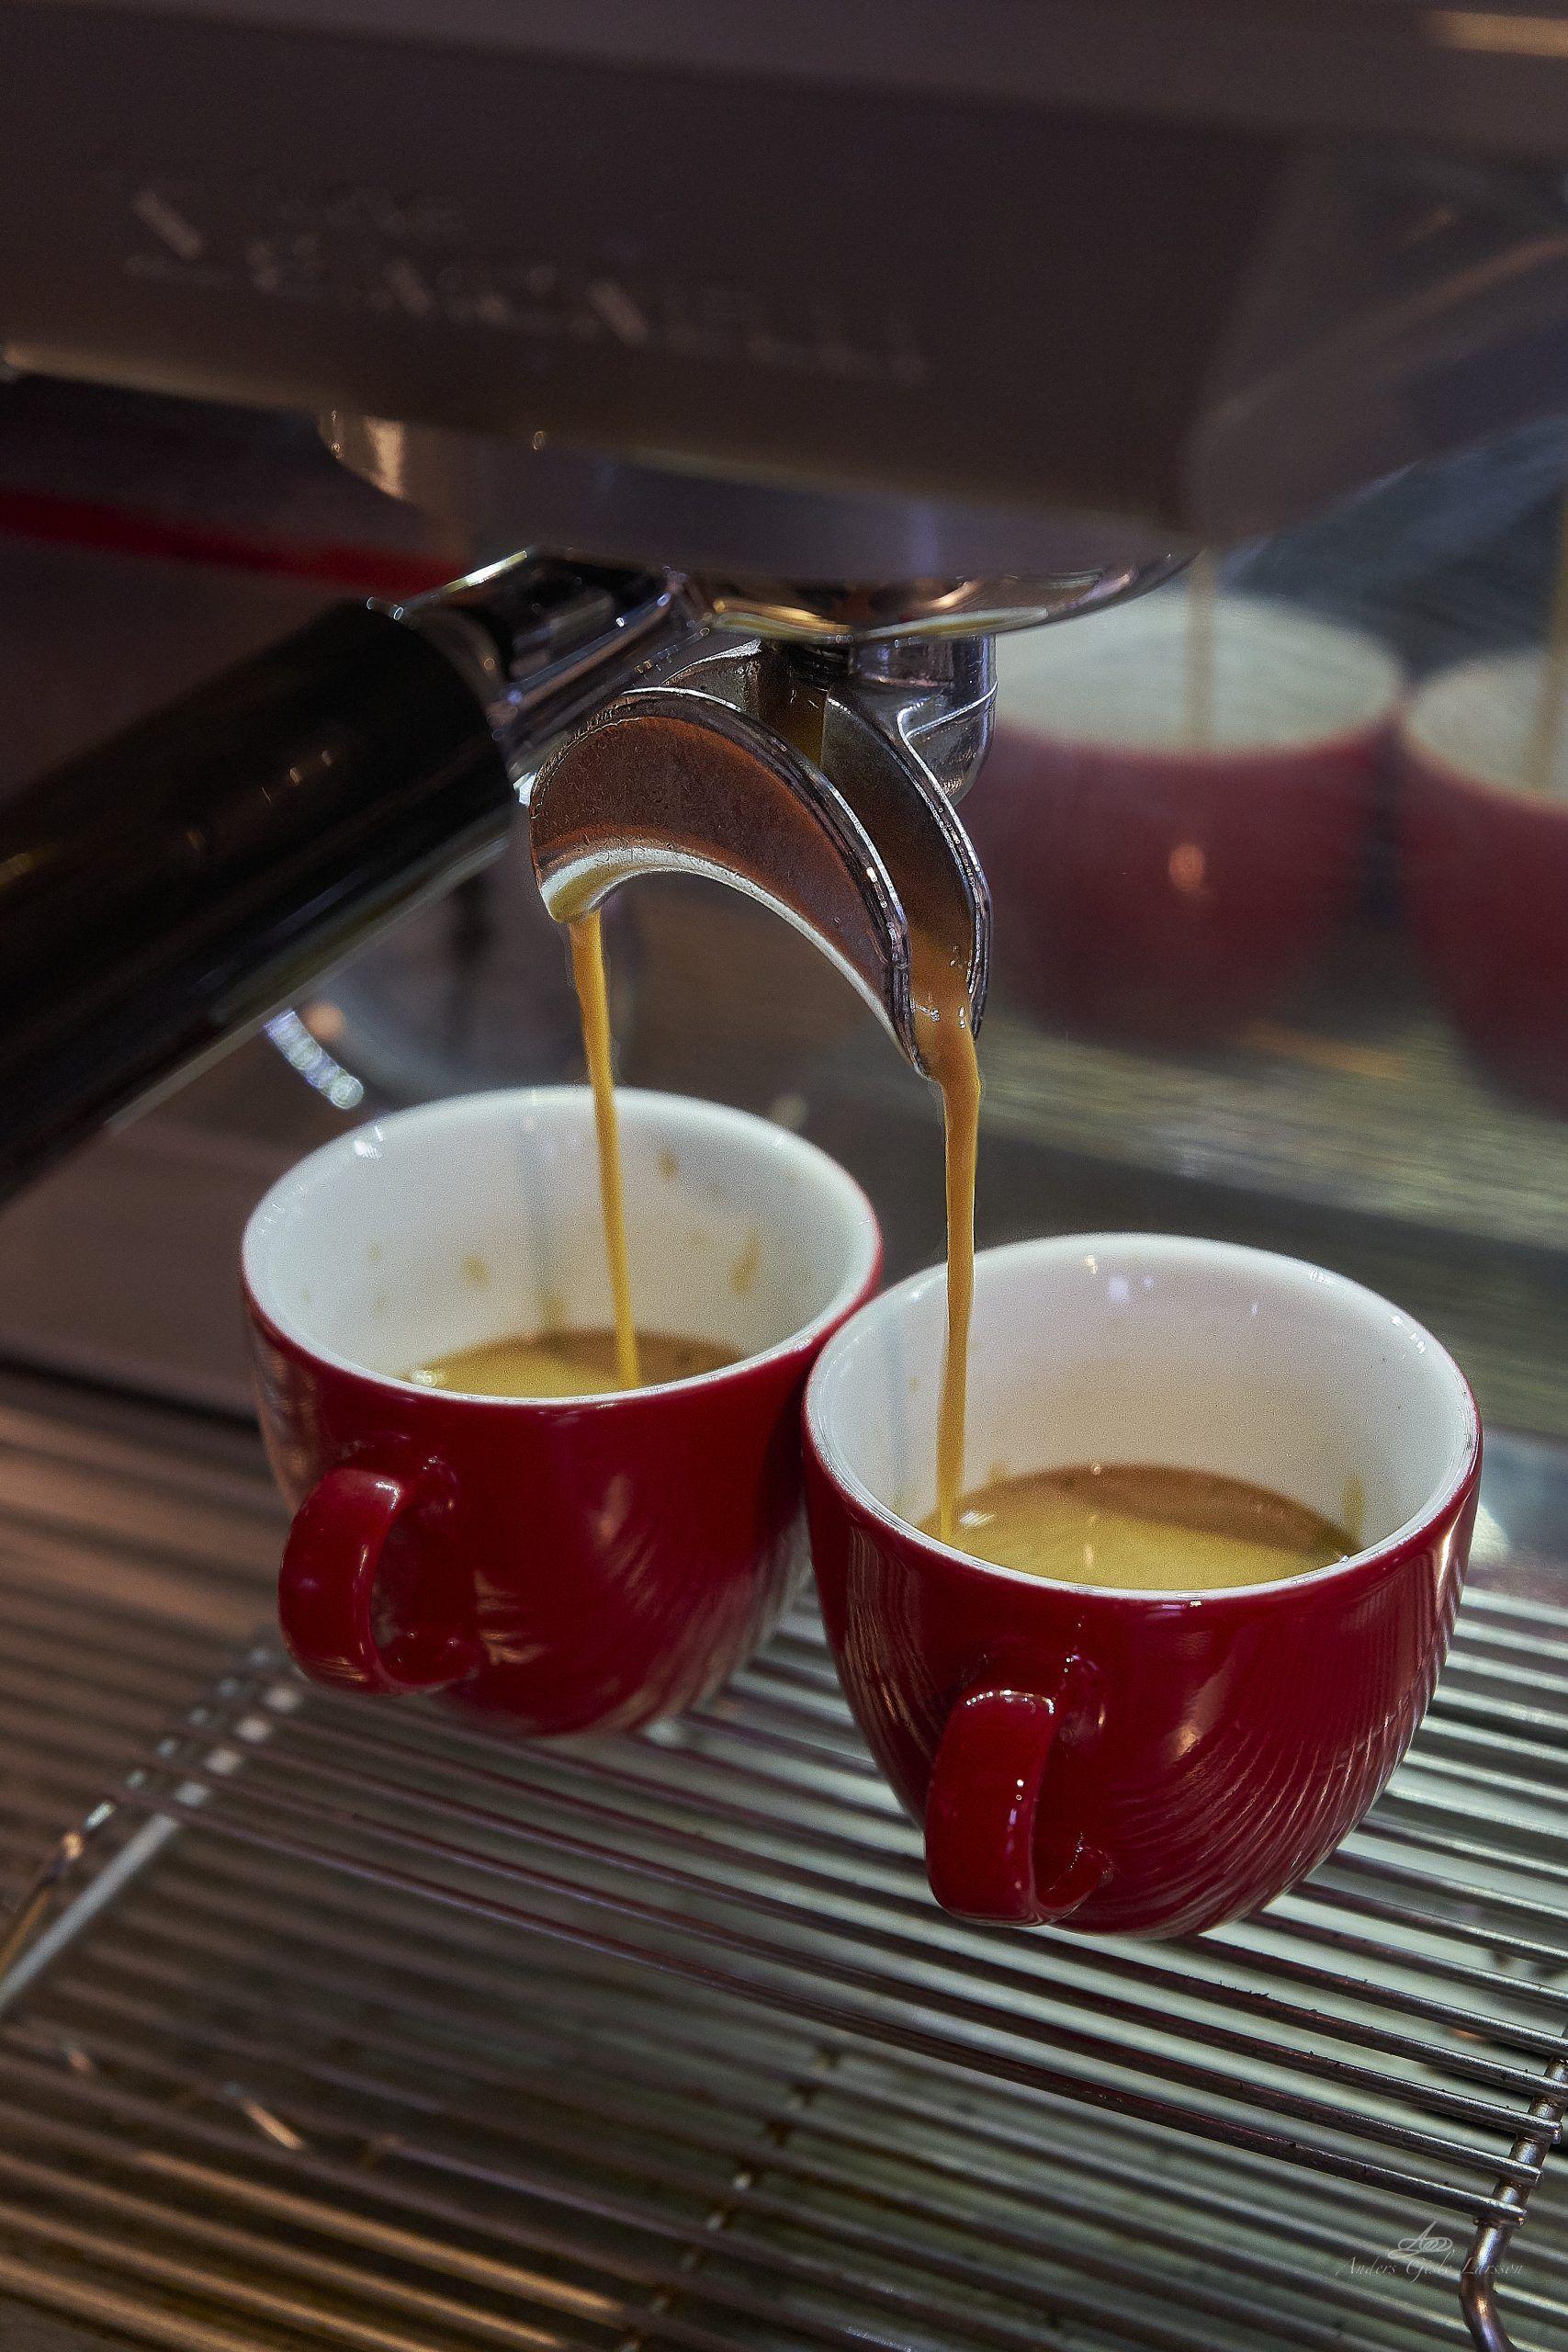 157/365, Espresso, Assentoft, Randers